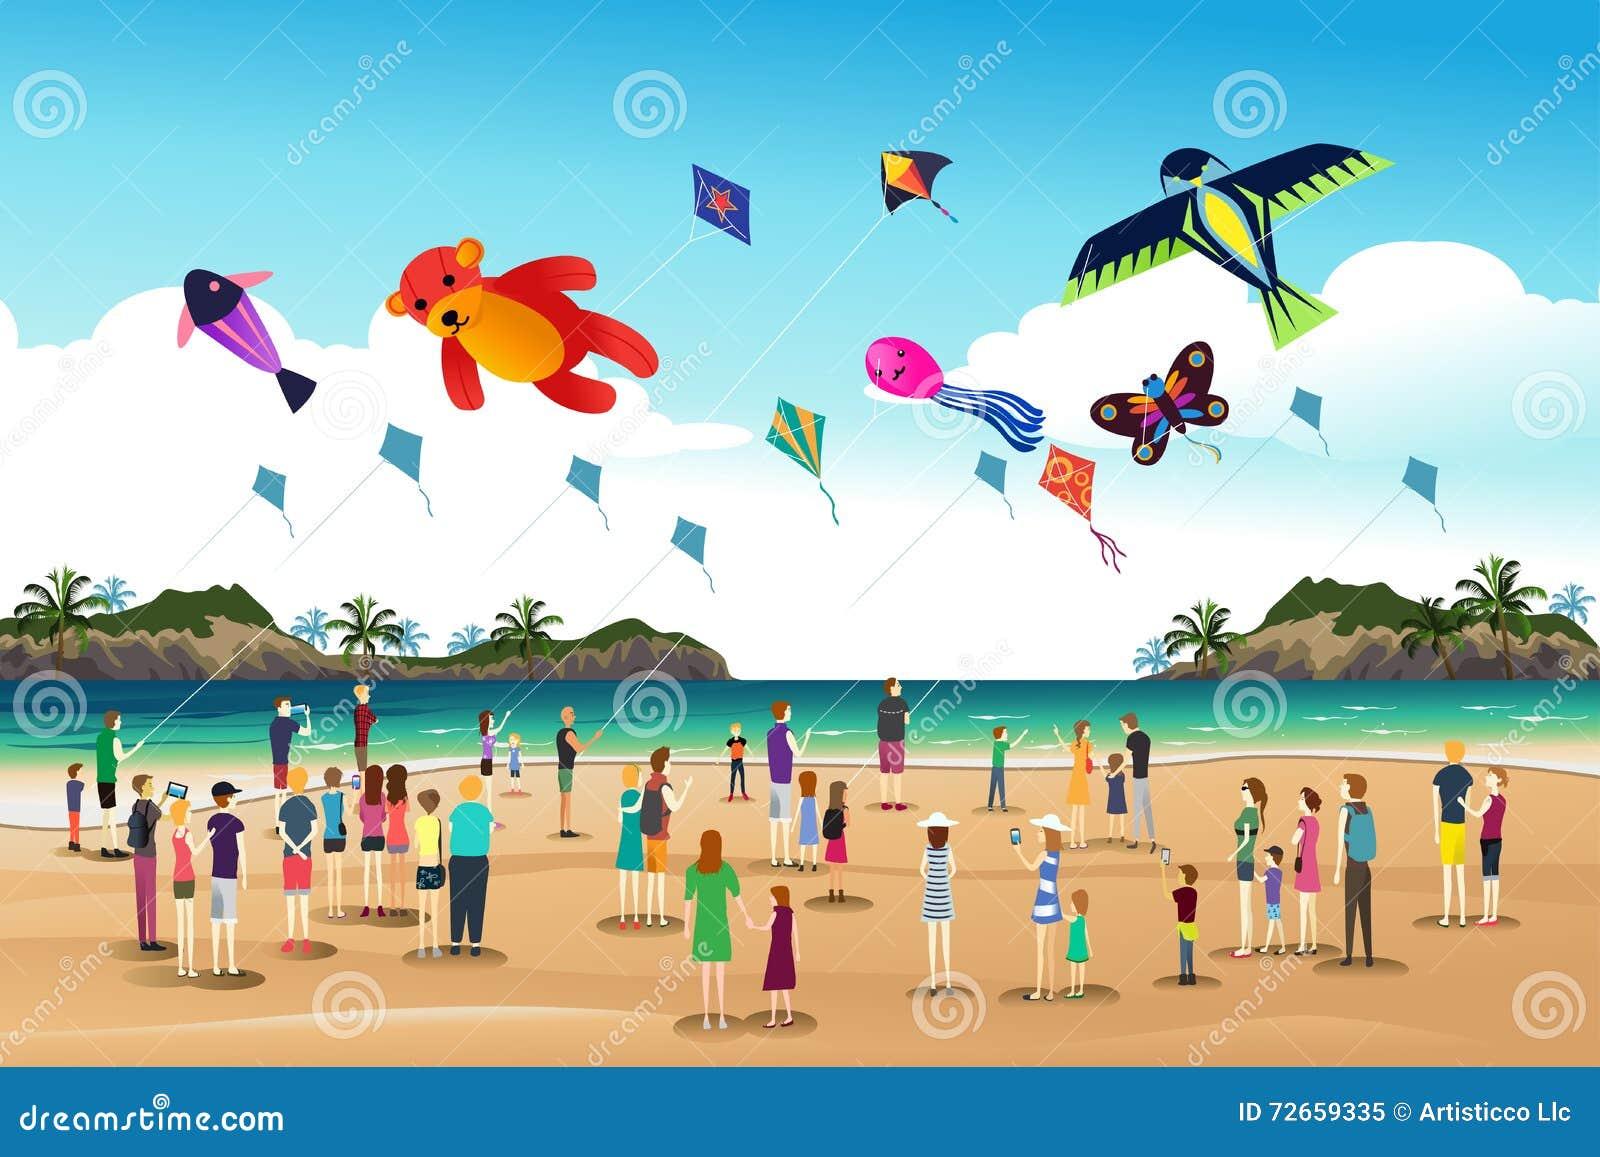 People Flying Kites At The Kite Festival Stock Vector Illustration